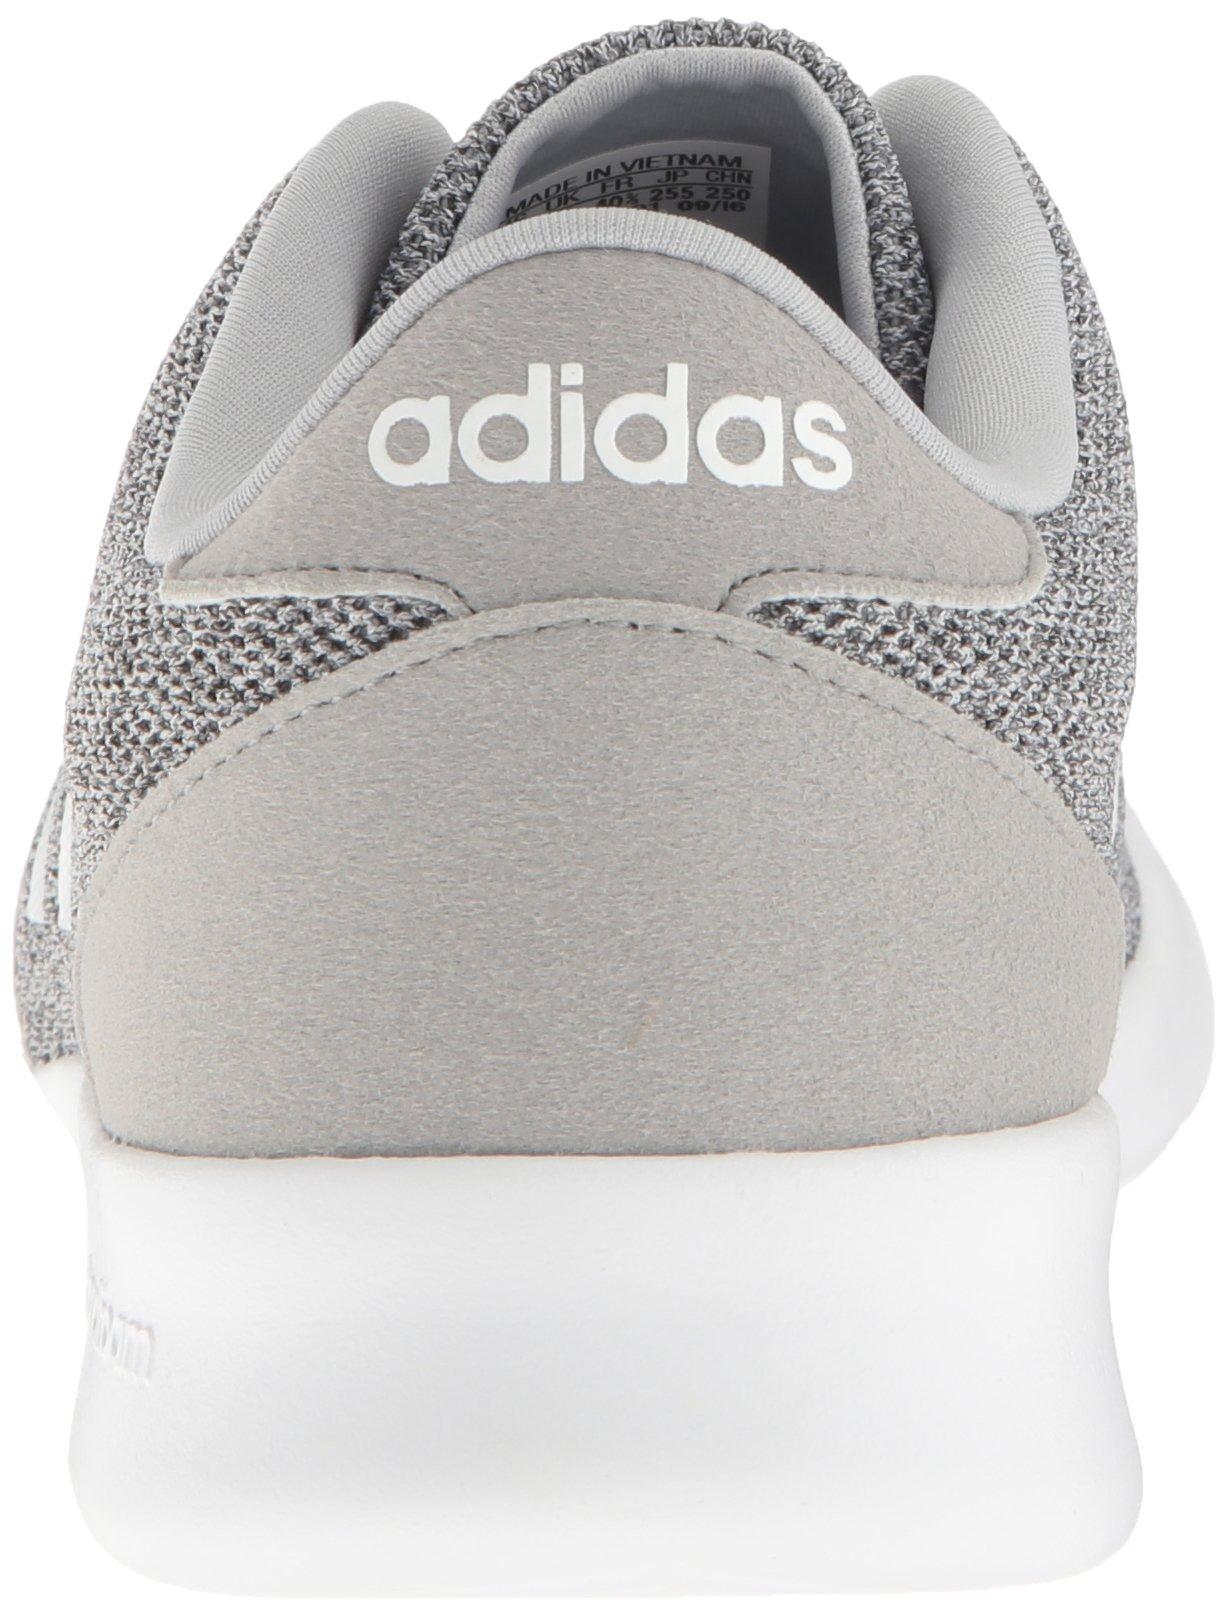 adidas Women's Cloudfoam Qt Racer w Running Shoe, Clear Onix/White/Light Onix, 5 M US by adidas (Image #2)